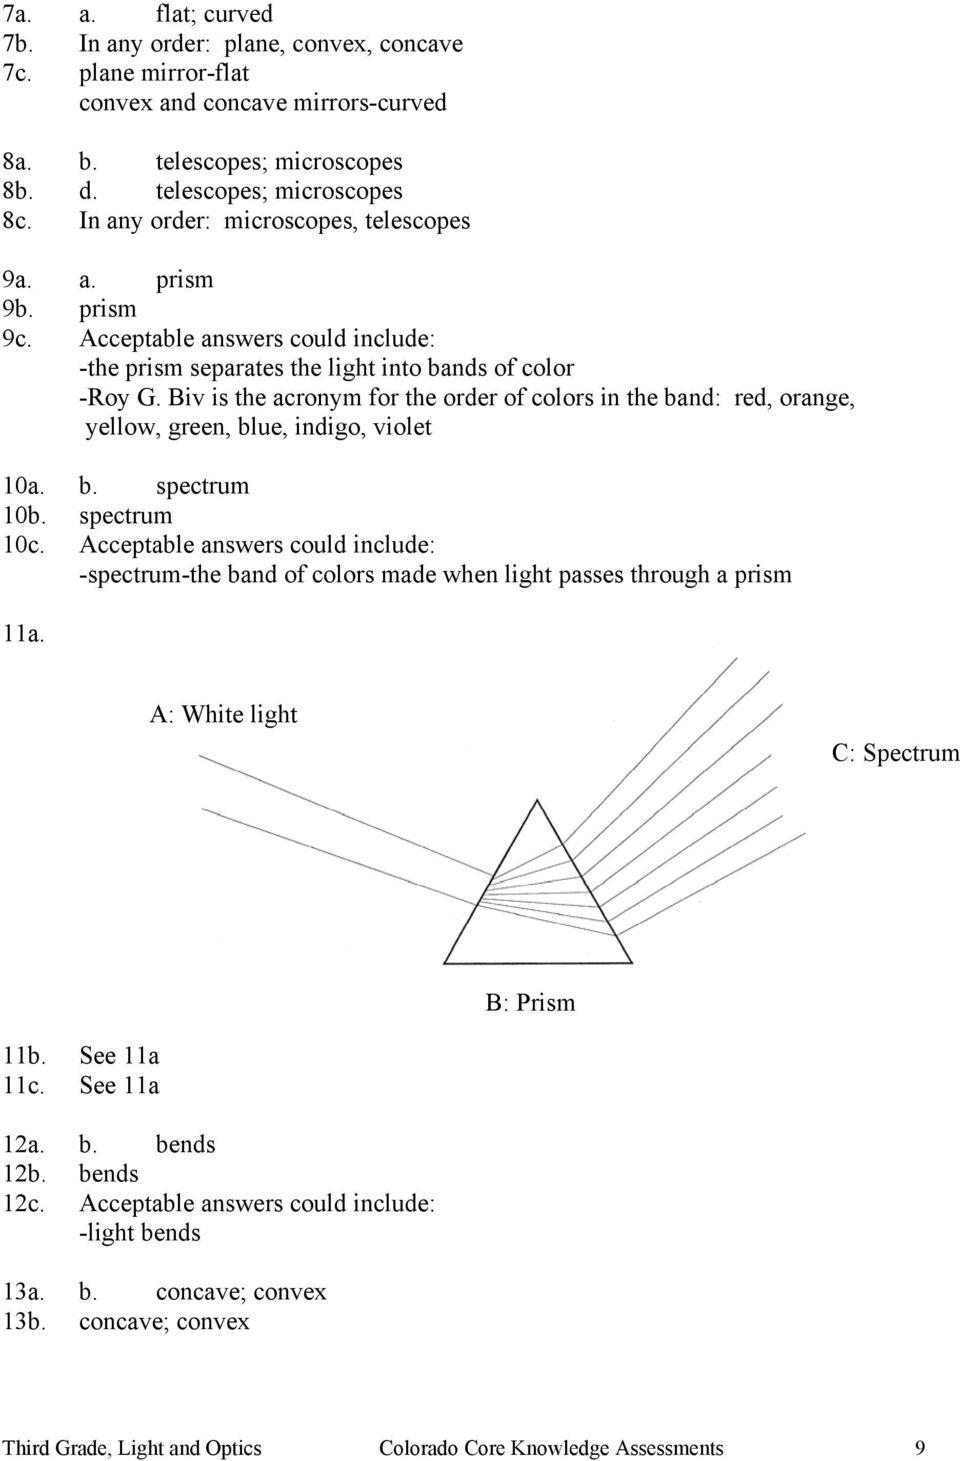 medium resolution of Third Grade Light and Optics Assessment - PDF Free Download